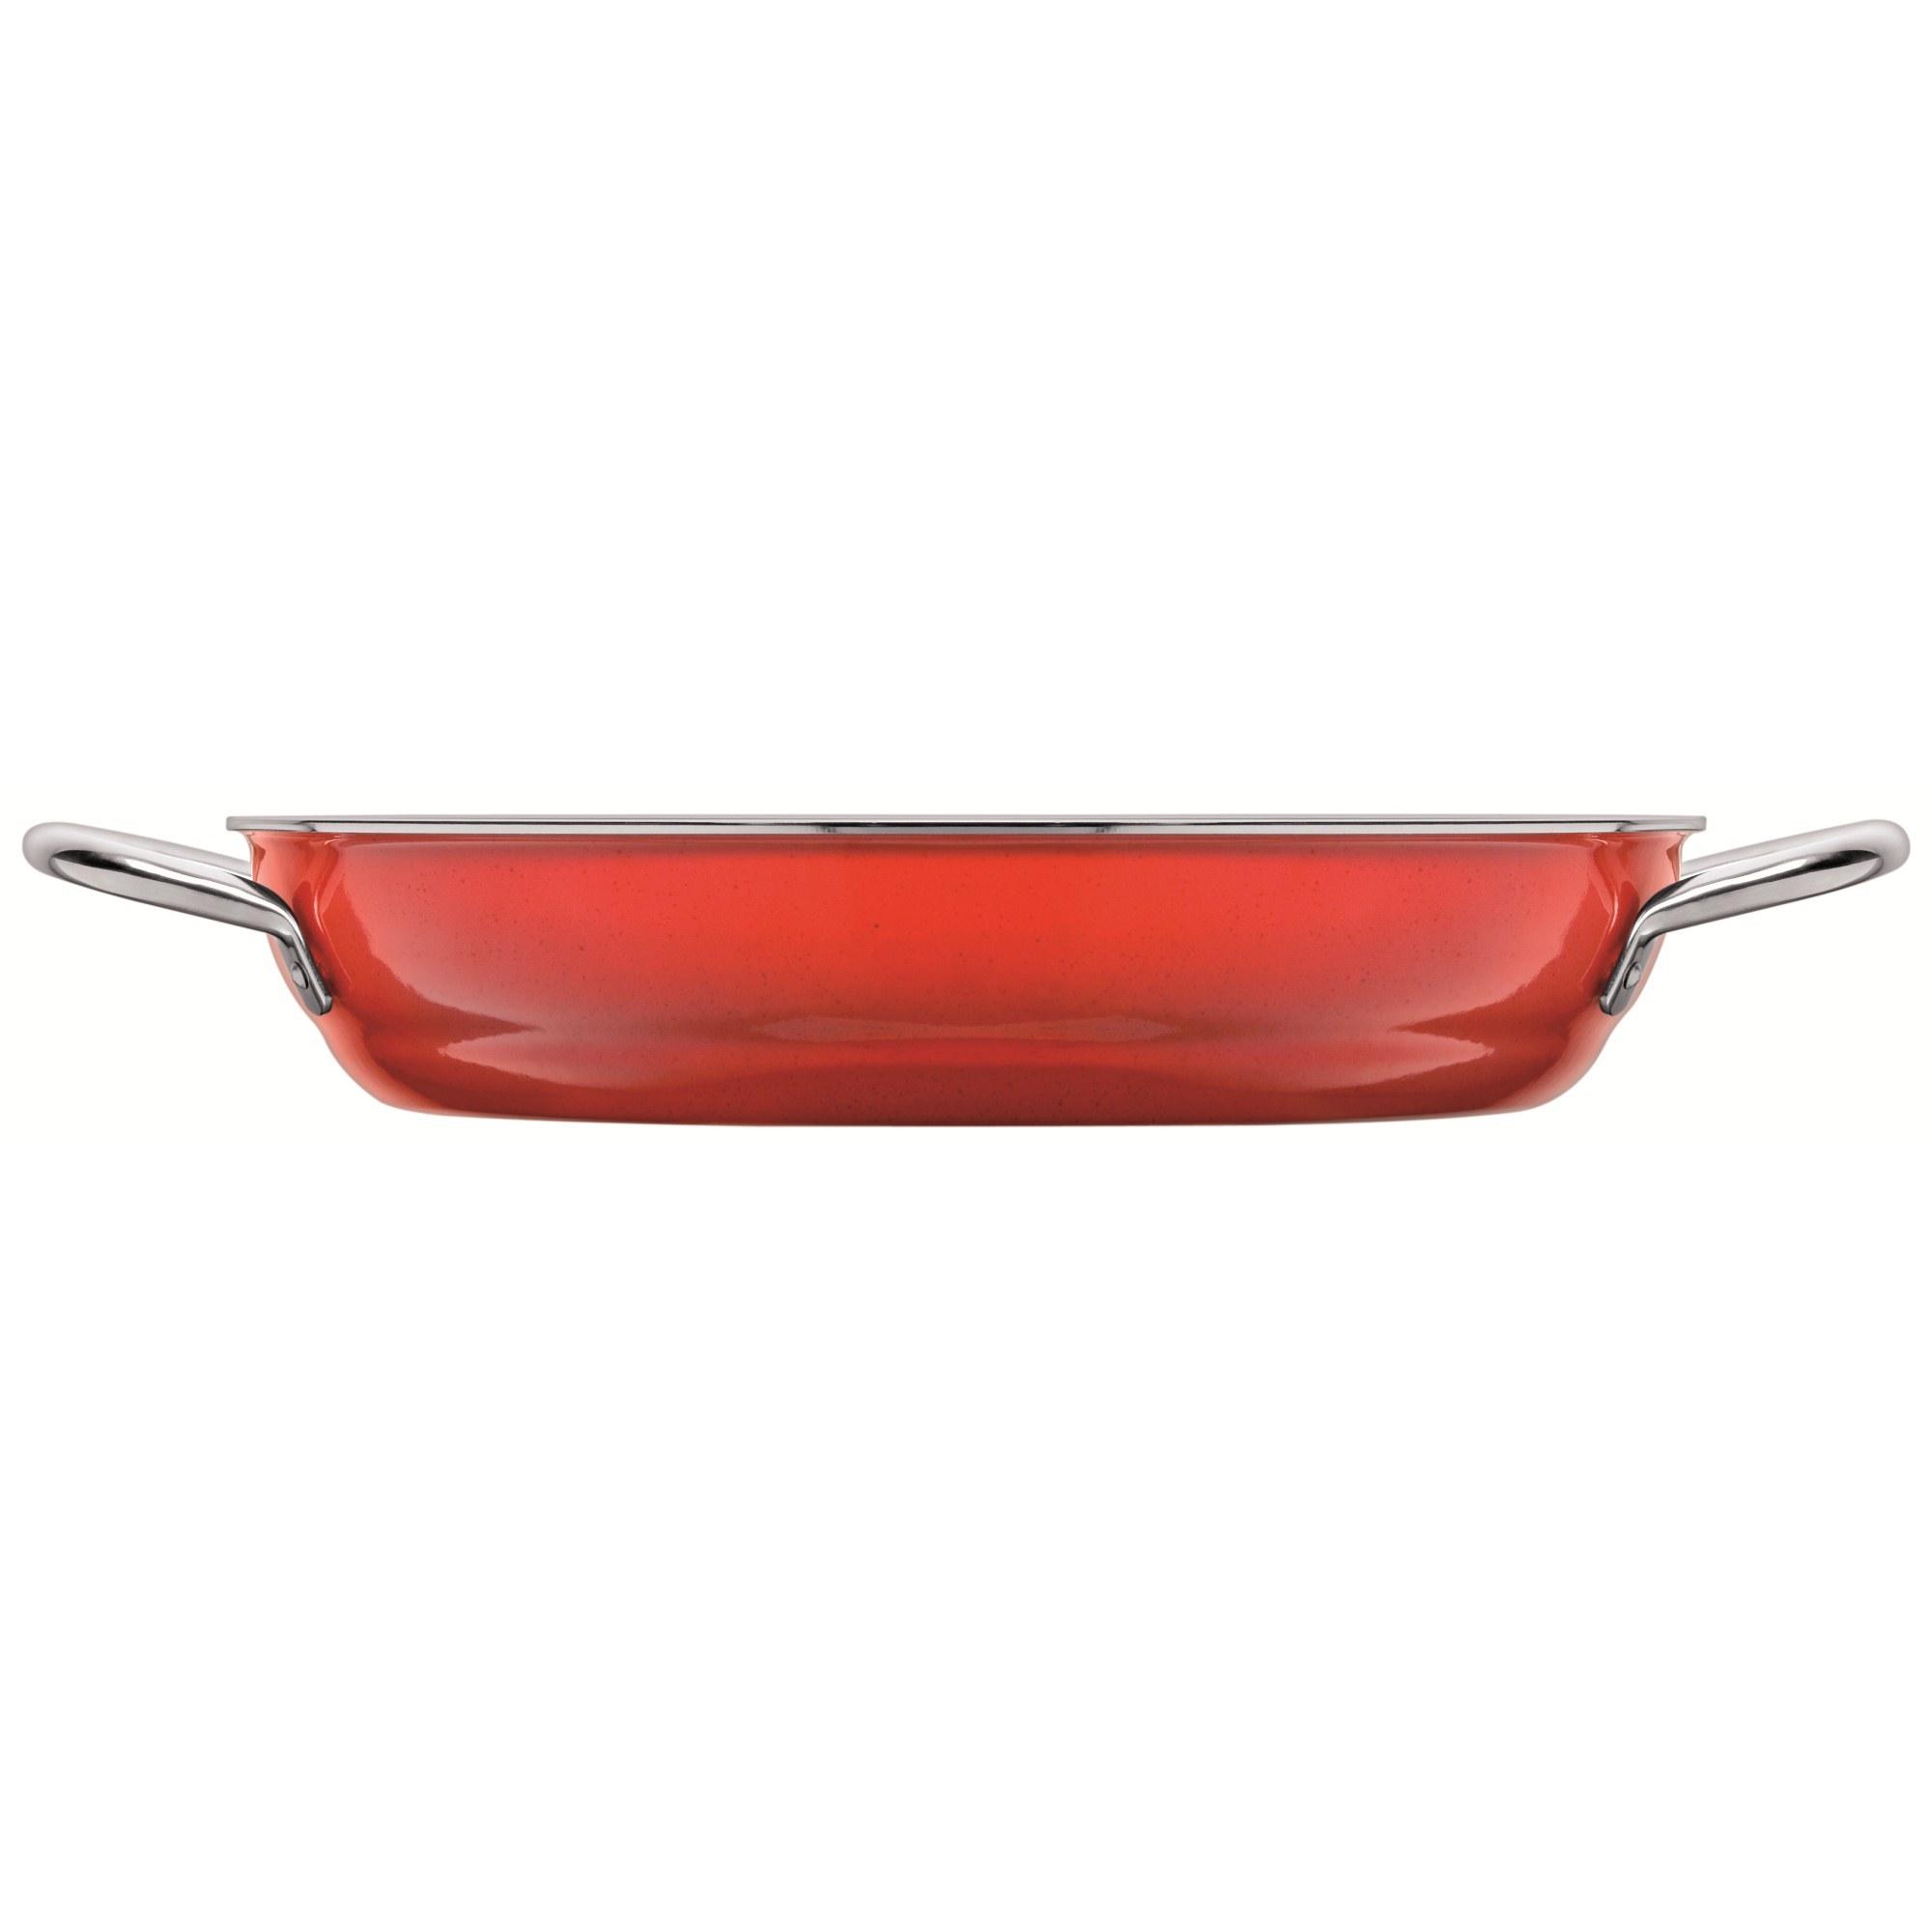 silit passion colours energy red servierpfanne 28 cm ebay. Black Bedroom Furniture Sets. Home Design Ideas